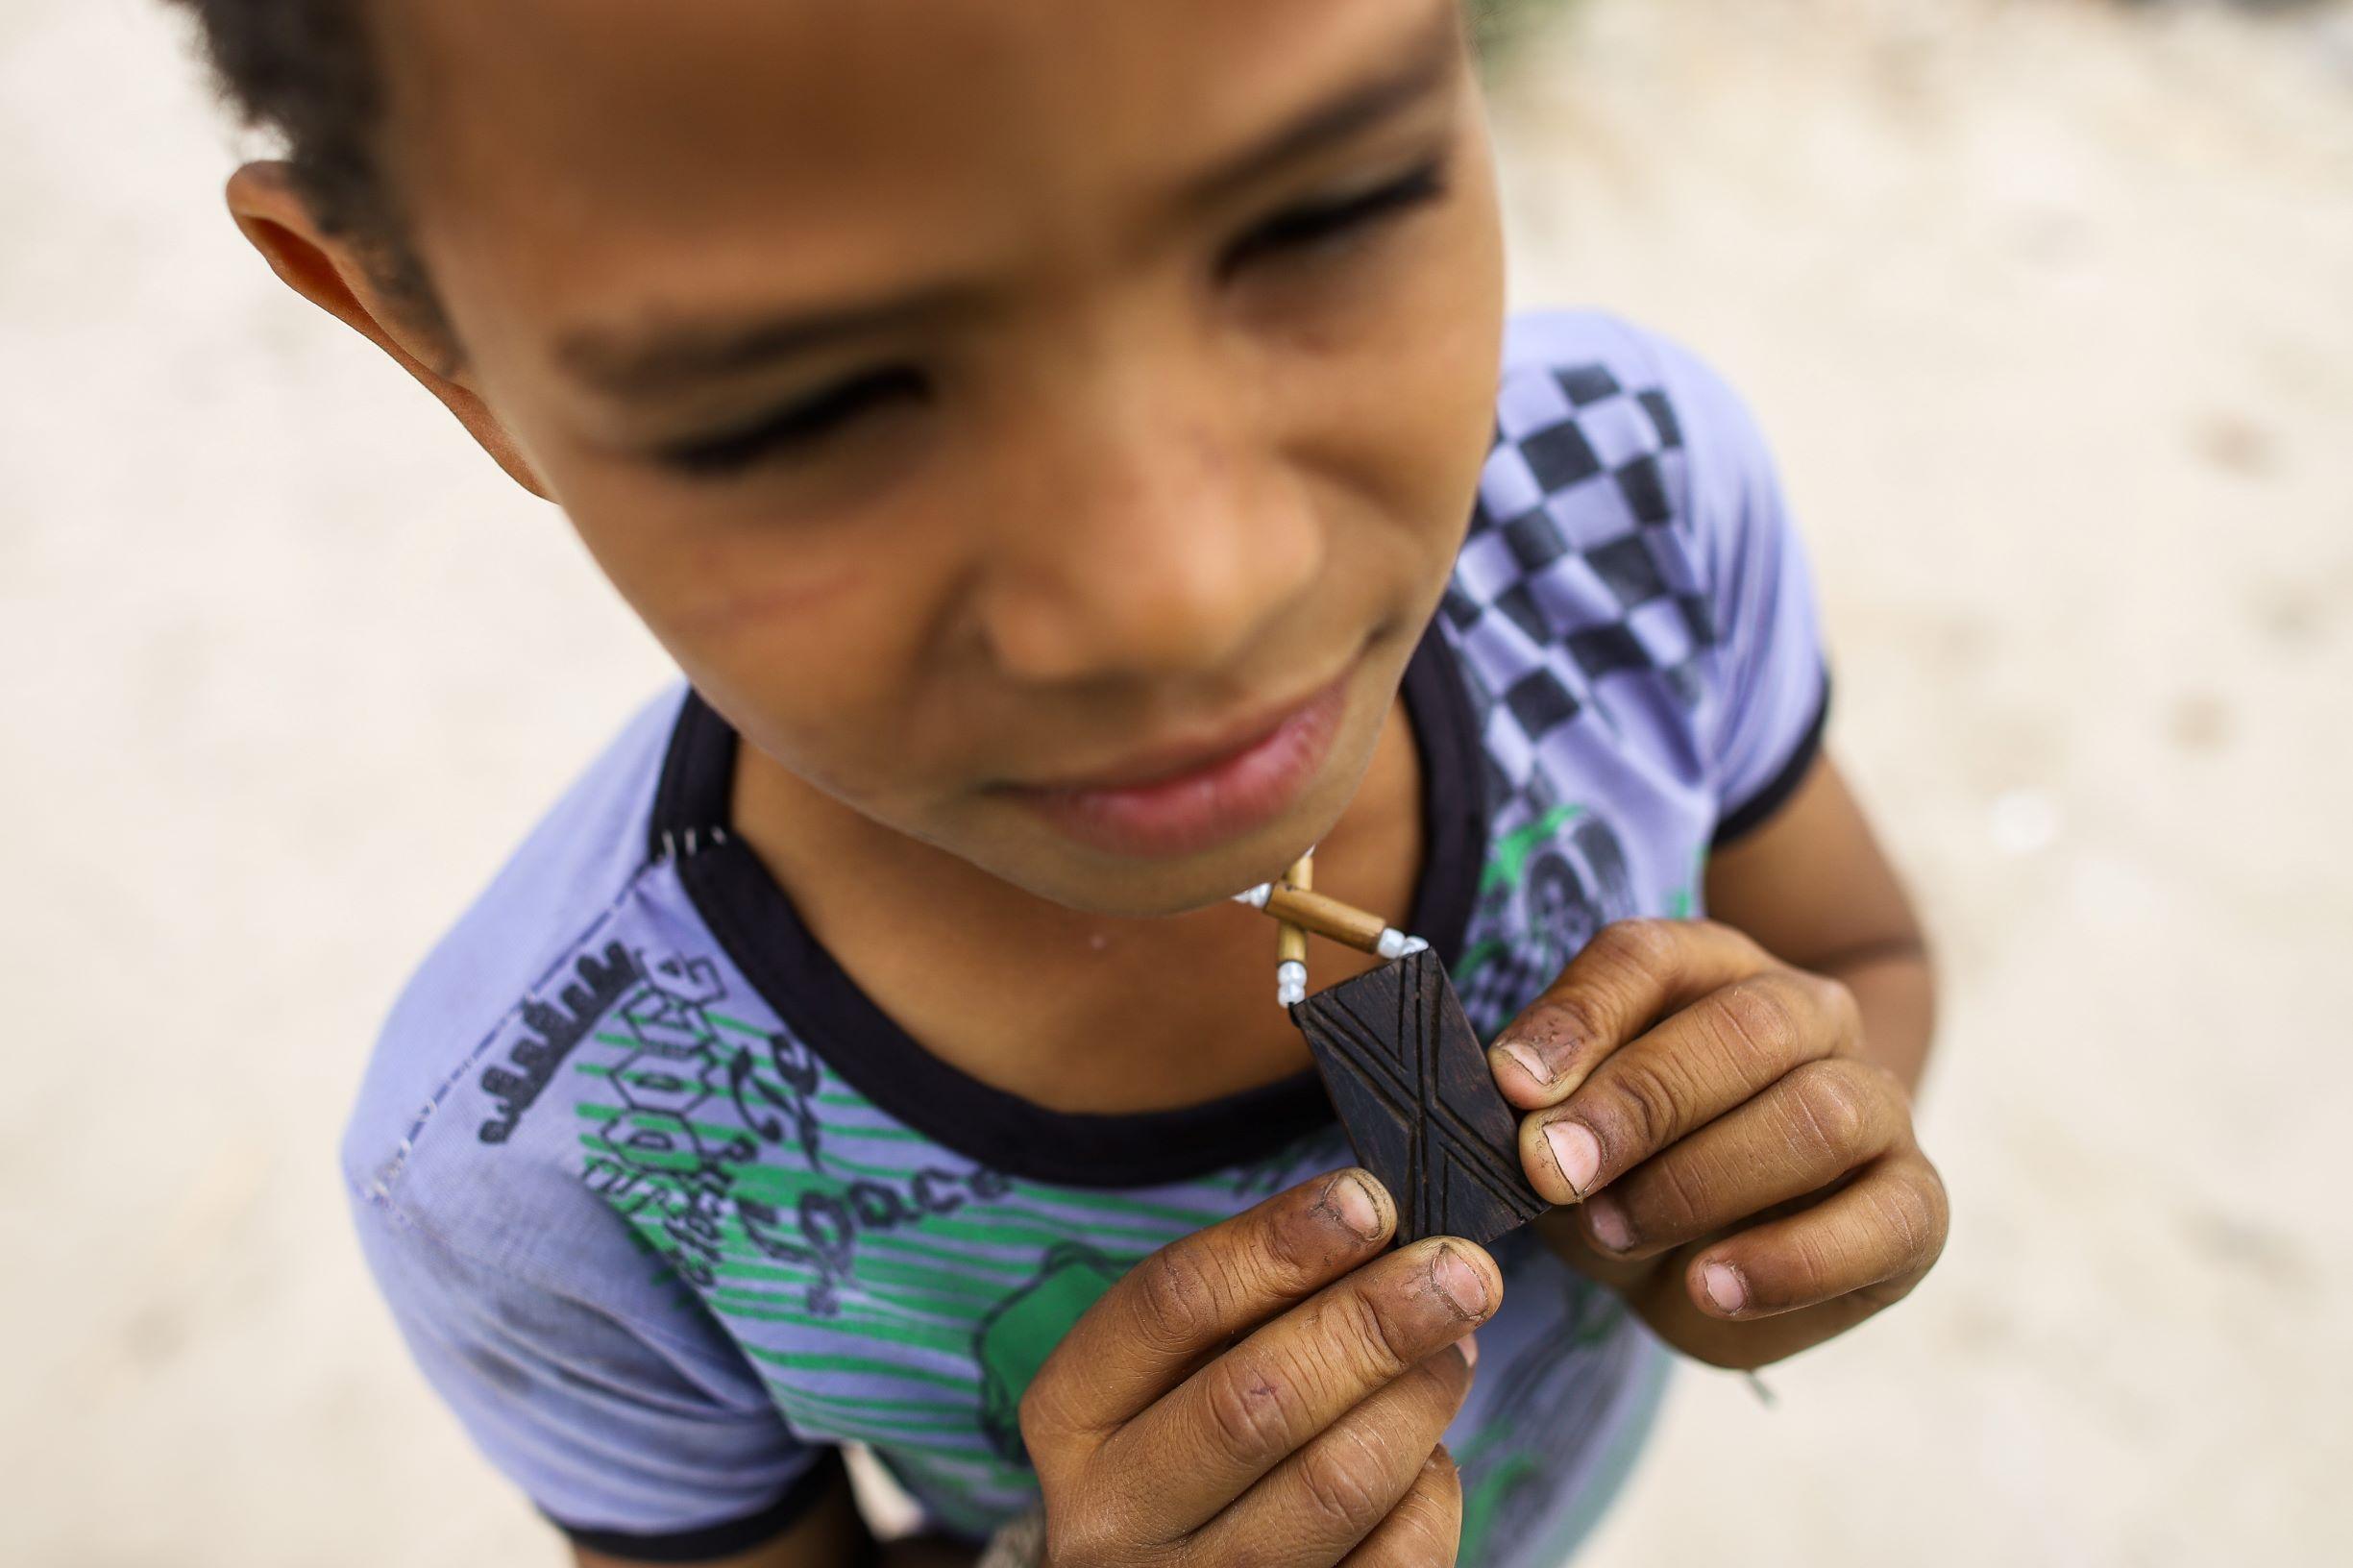 Menino Xakriabá mostra artesanato indígena feito na escola: professores de cultura ensinam a língua, pinturas, cantos, saberes e histórias (Foto: Flávio Tavares)